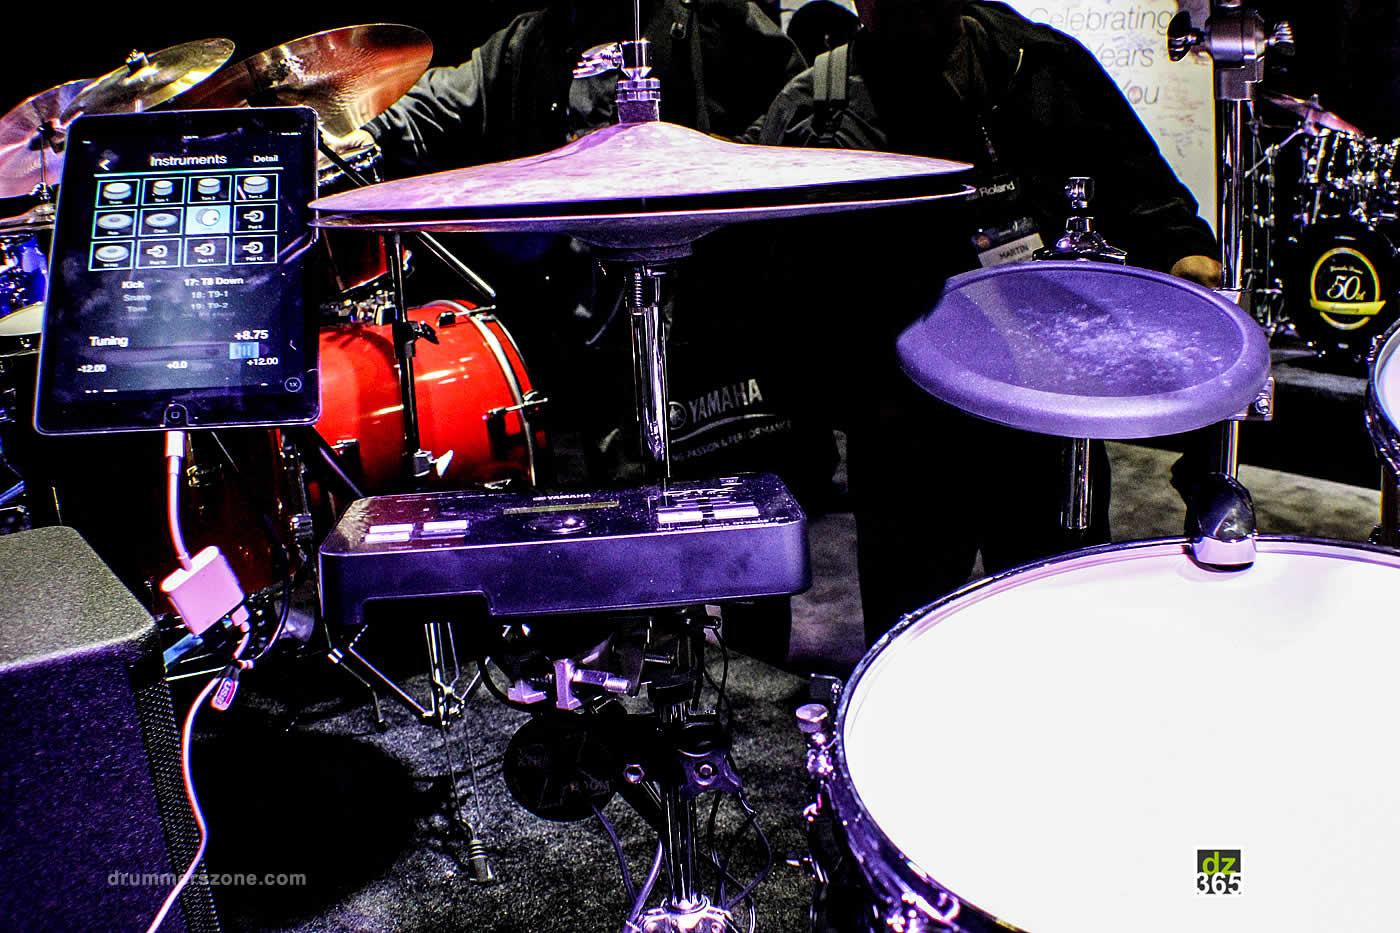 drummerszone notizie yamaha dt50 drum triggers at namm 2017. Black Bedroom Furniture Sets. Home Design Ideas